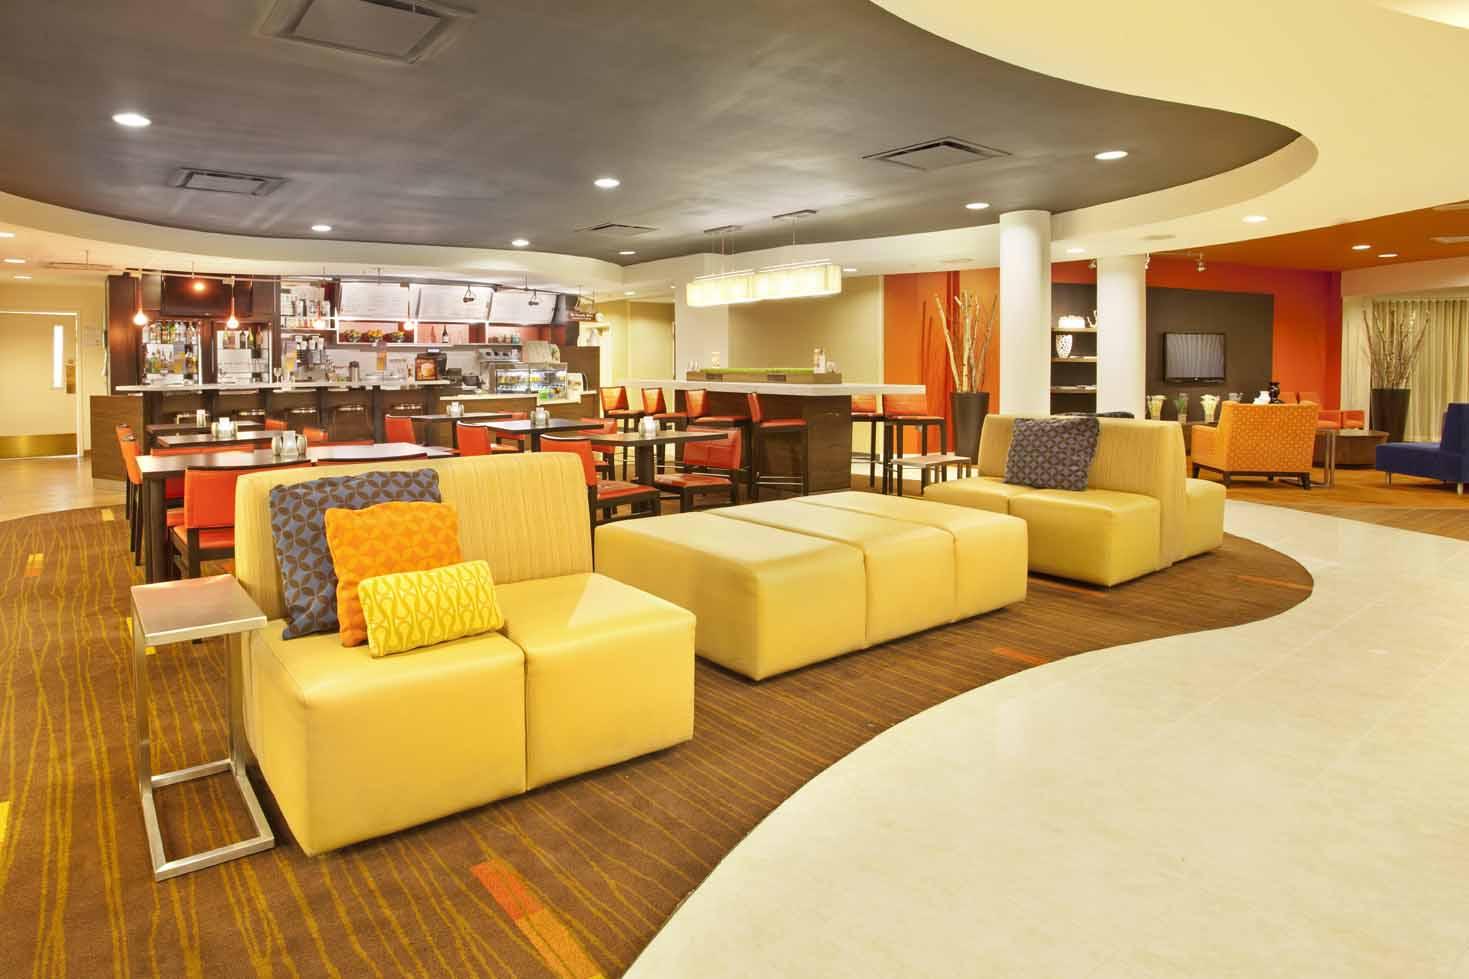 Courtyard Inn El Paso, TX: Dining Area